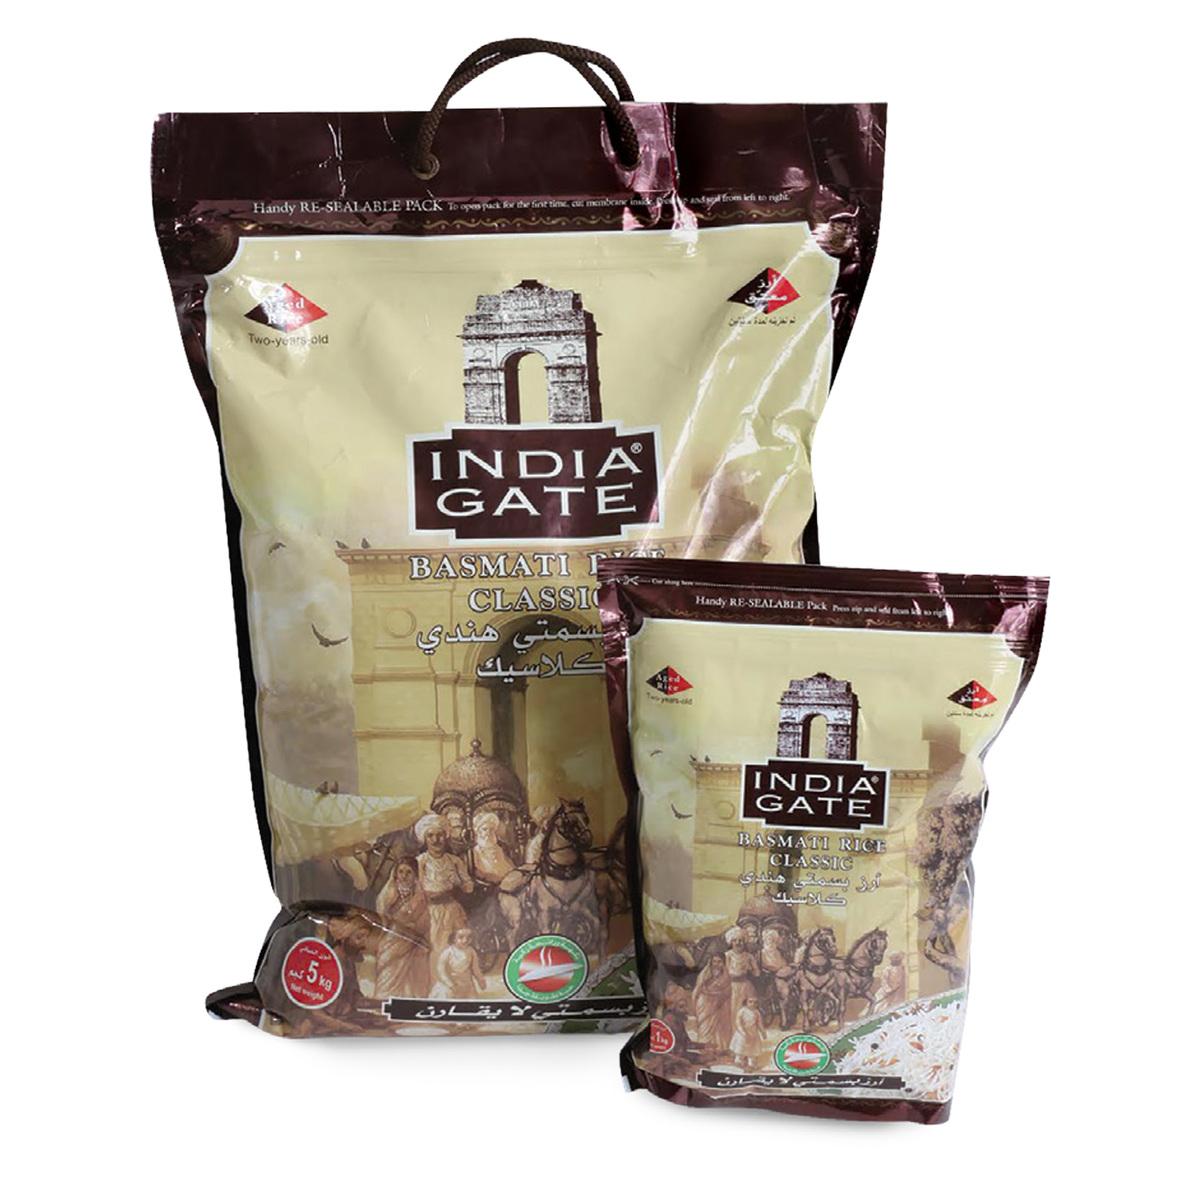 Buy India Gate Basmati Rice 5kg + 1kg - Basmati - Lulu